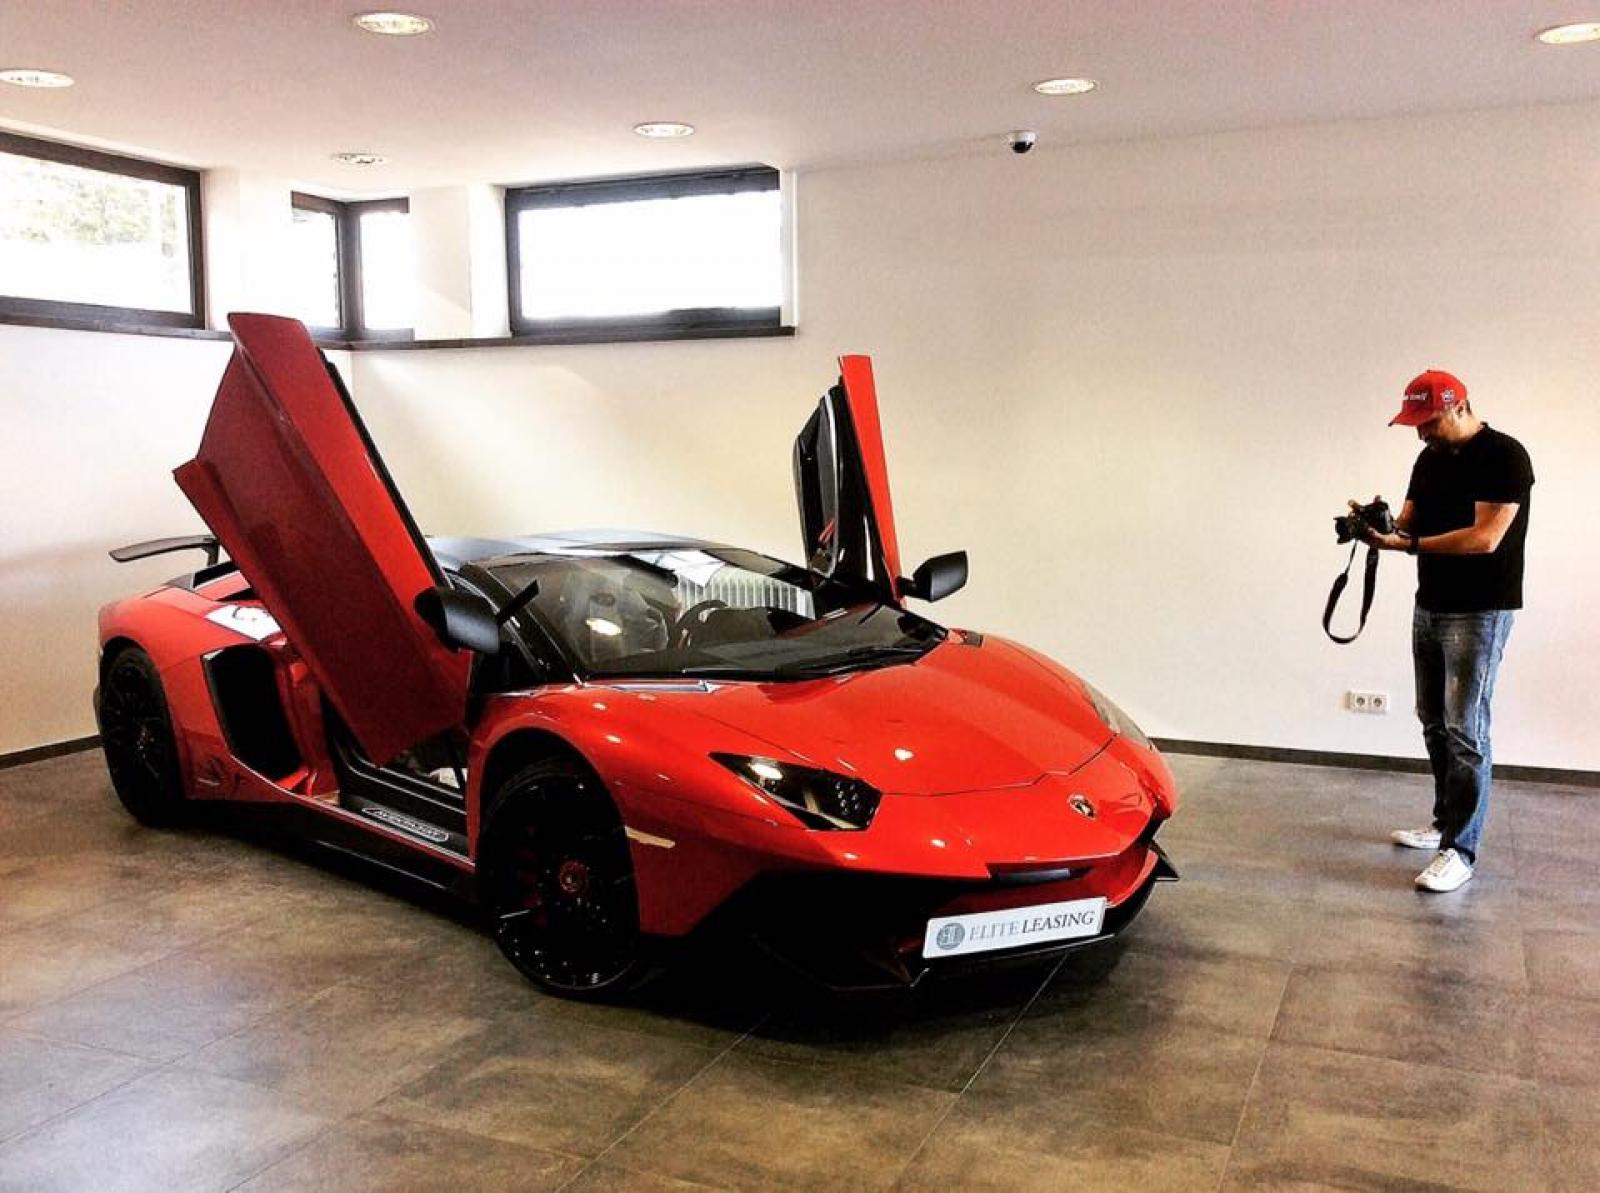 Red Lamborghini Aventador